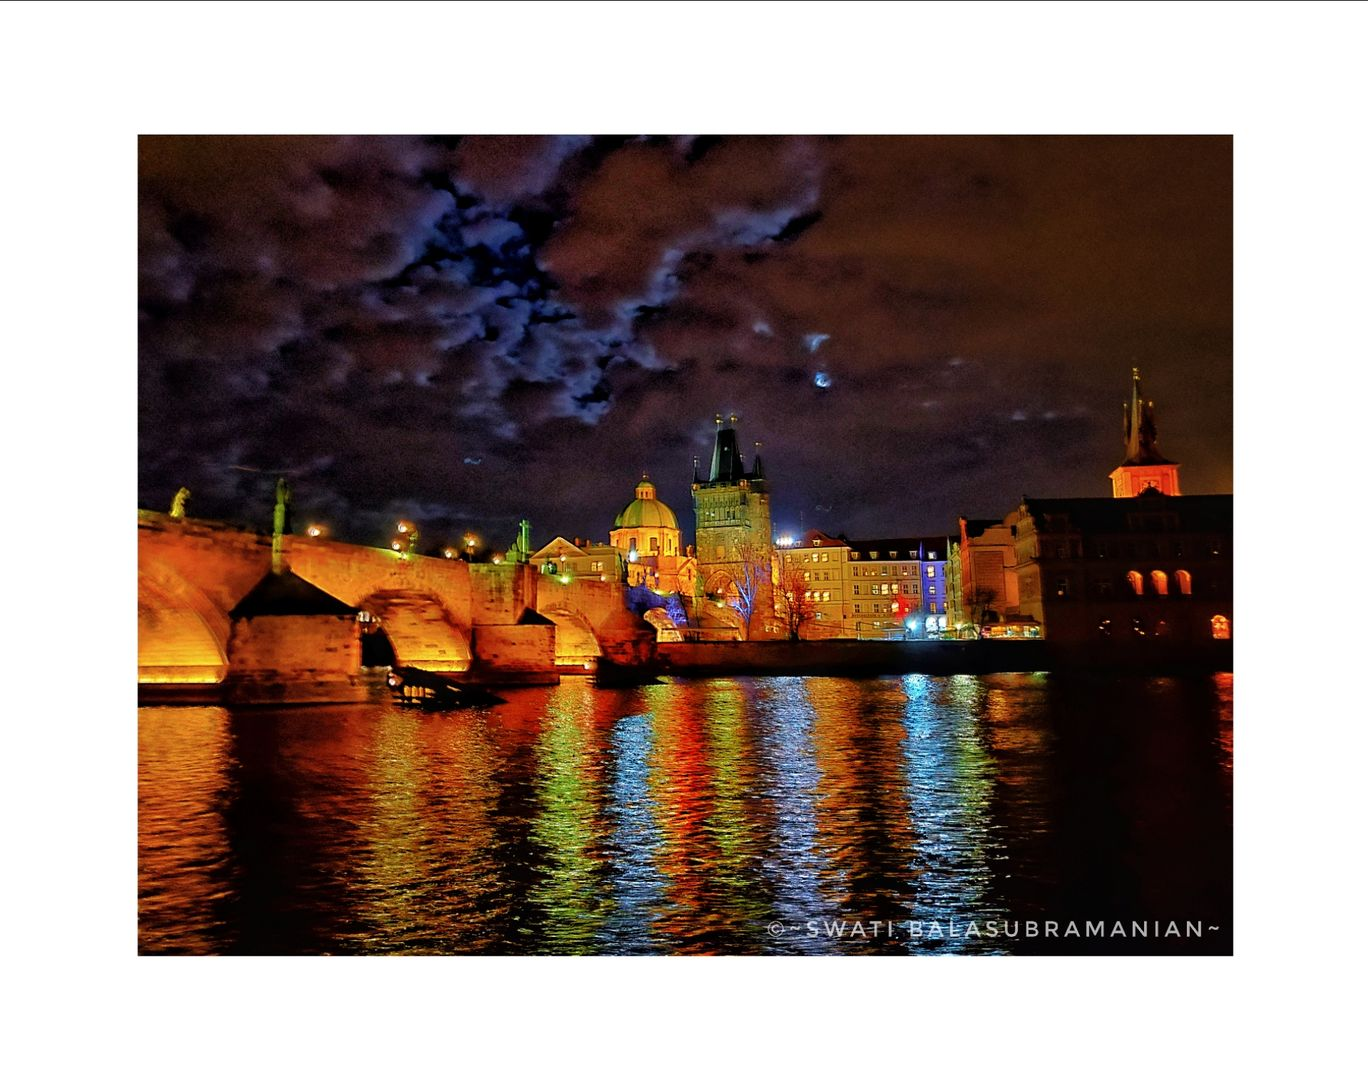 Photo of Prague By swati Balasubramanian